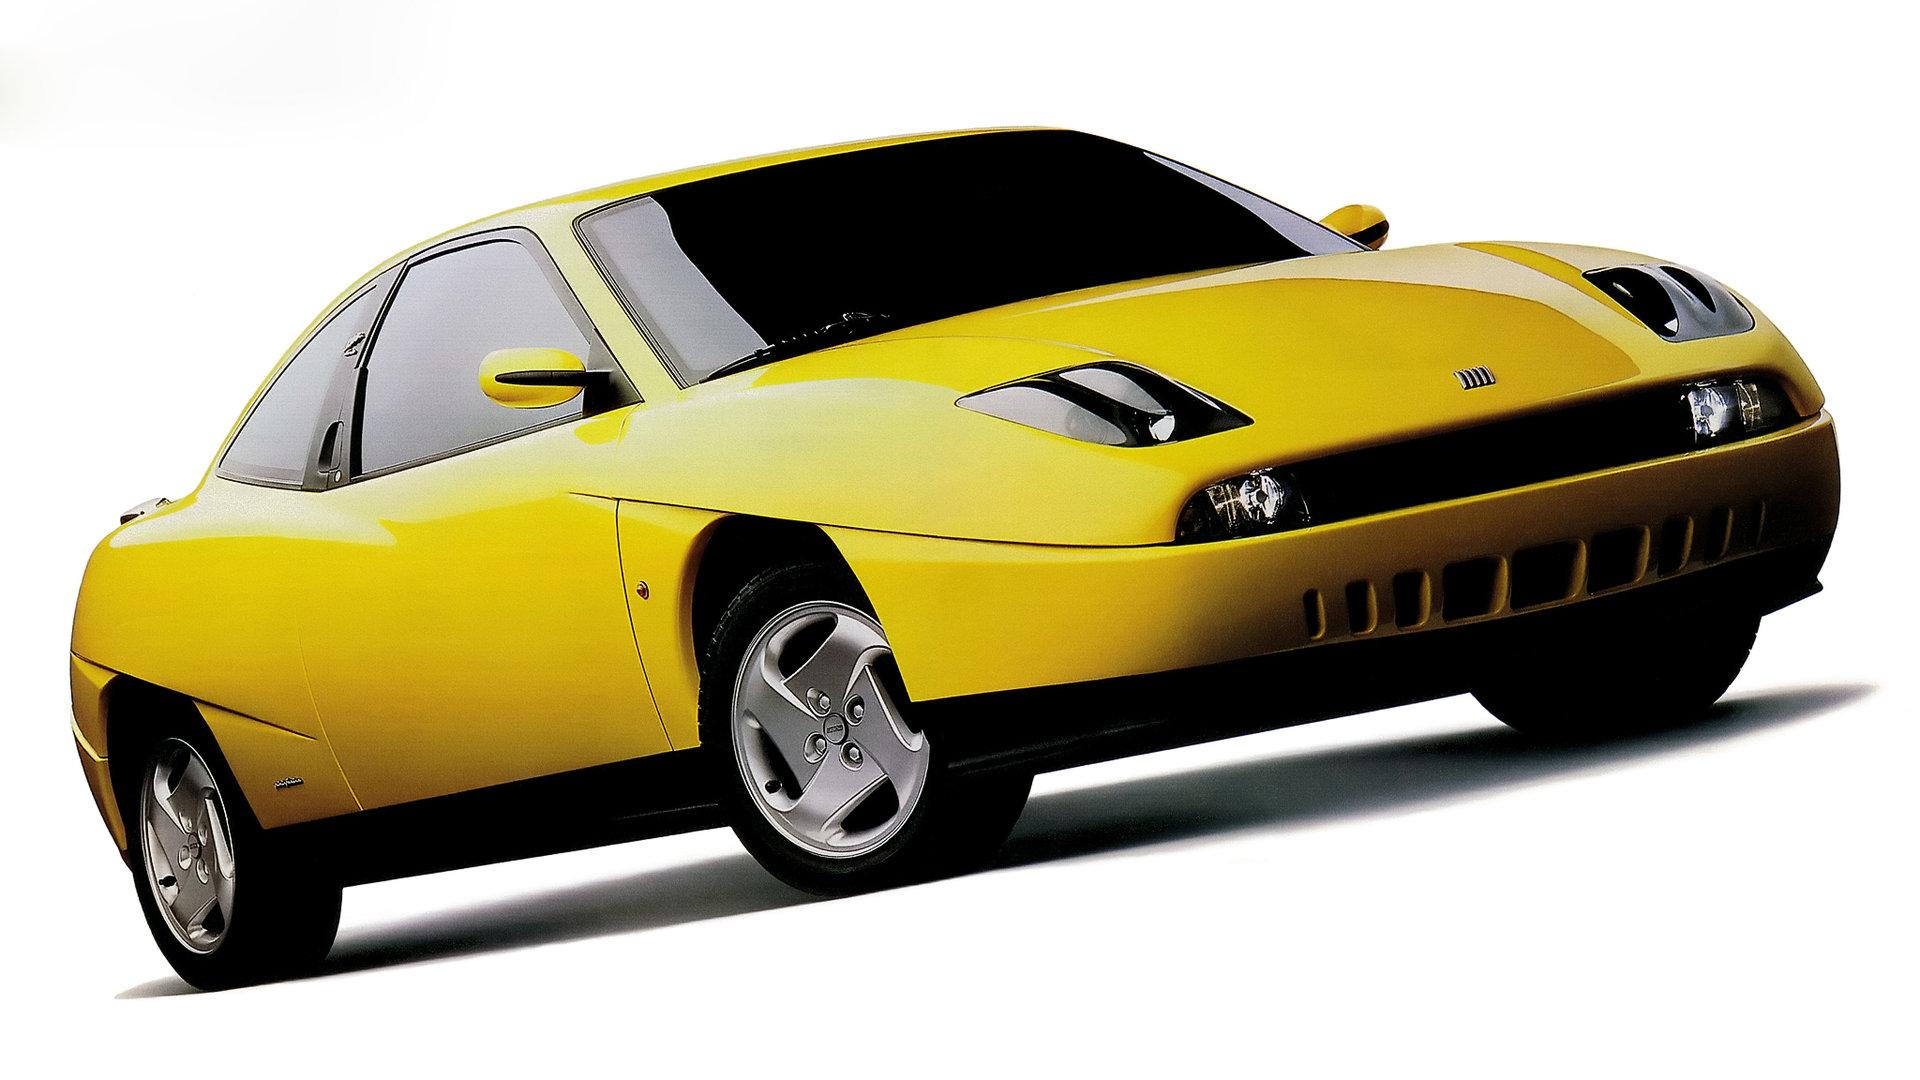 Coche del día: Fiat Coupé turbo